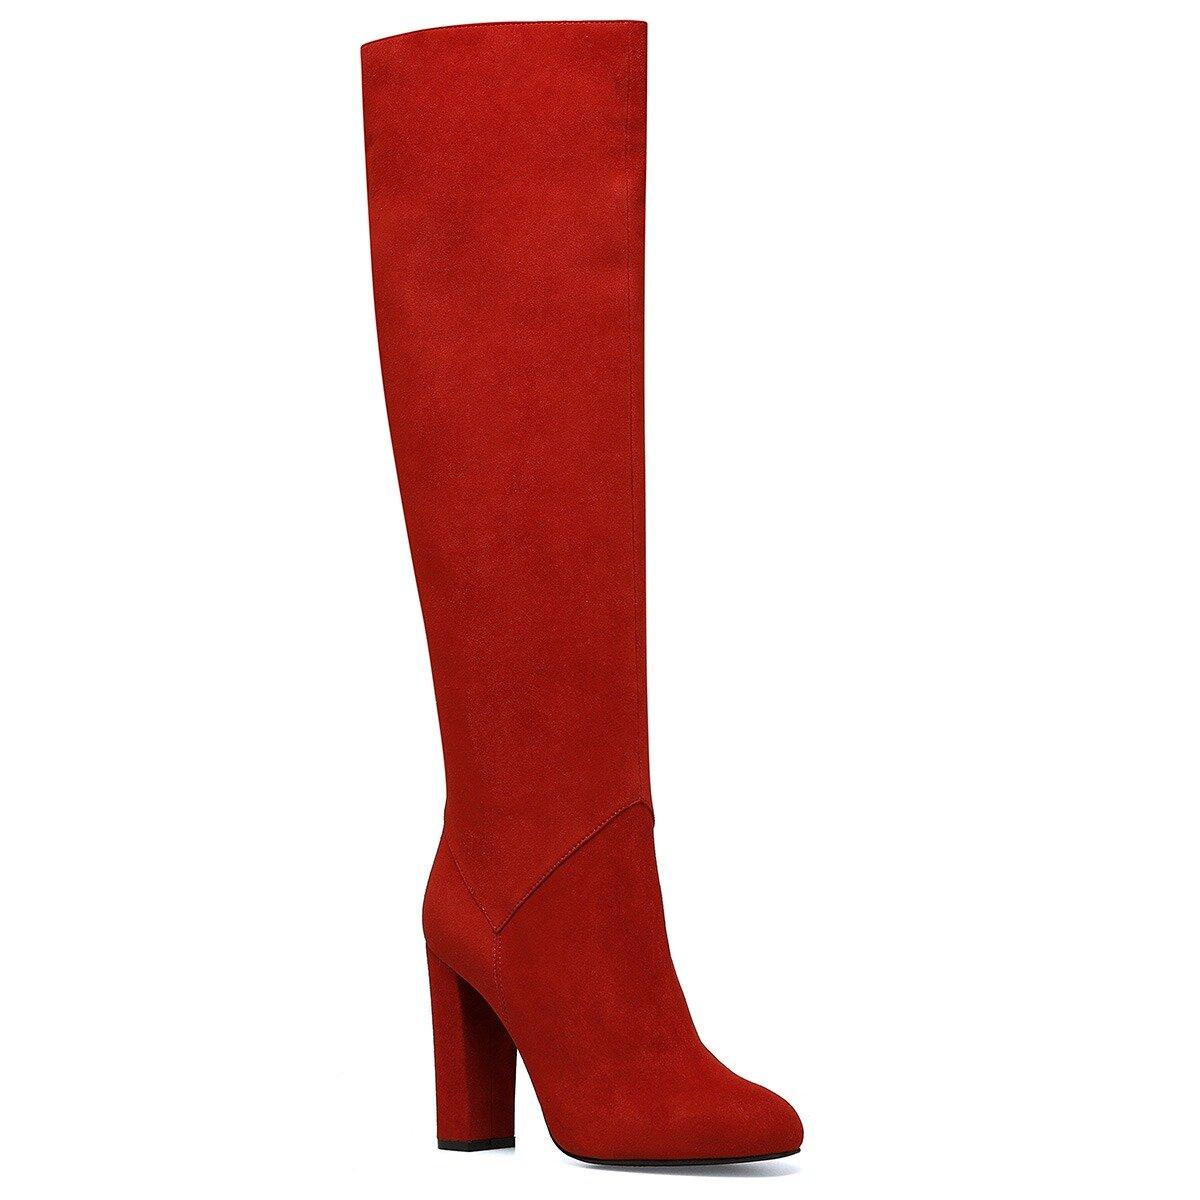 XTRA Kırmızı Kadın Topuklu Çizme